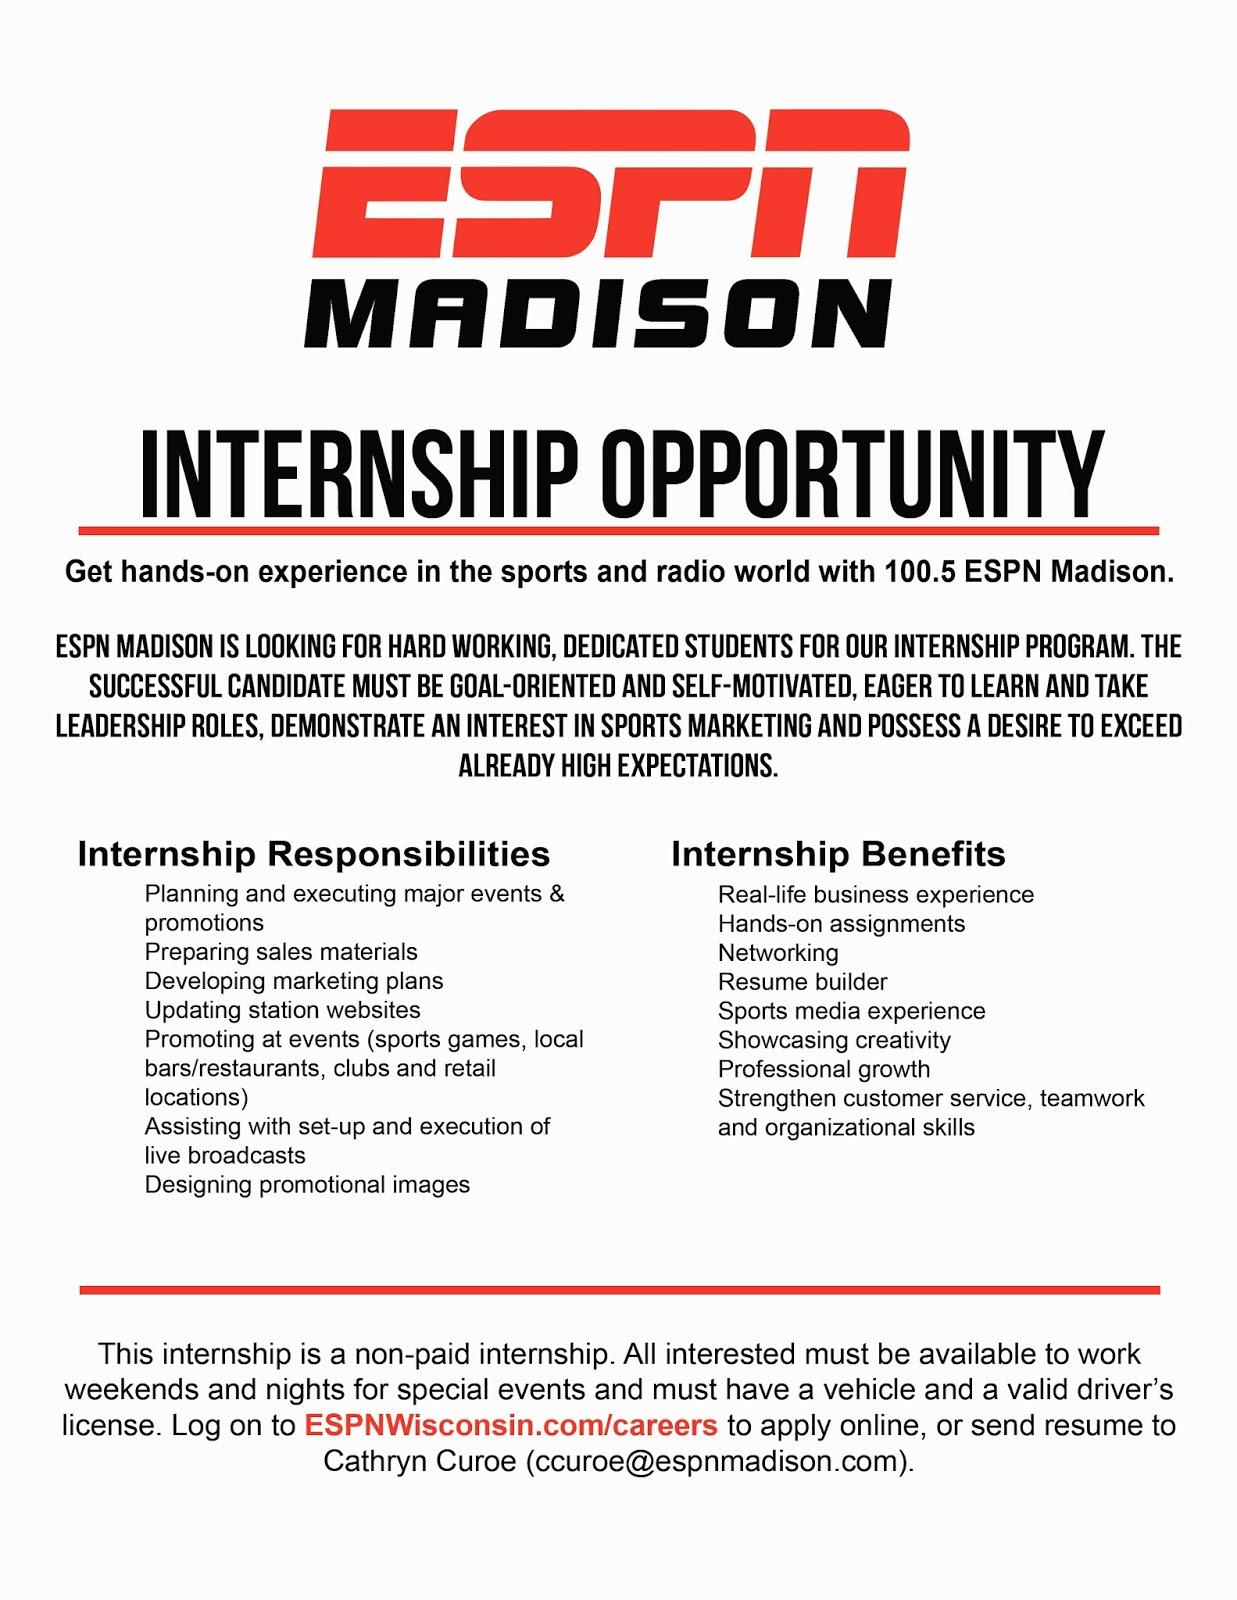 resume Uw Madison Resume sports business club at uw madison espn internship opportunity posted by 649 am